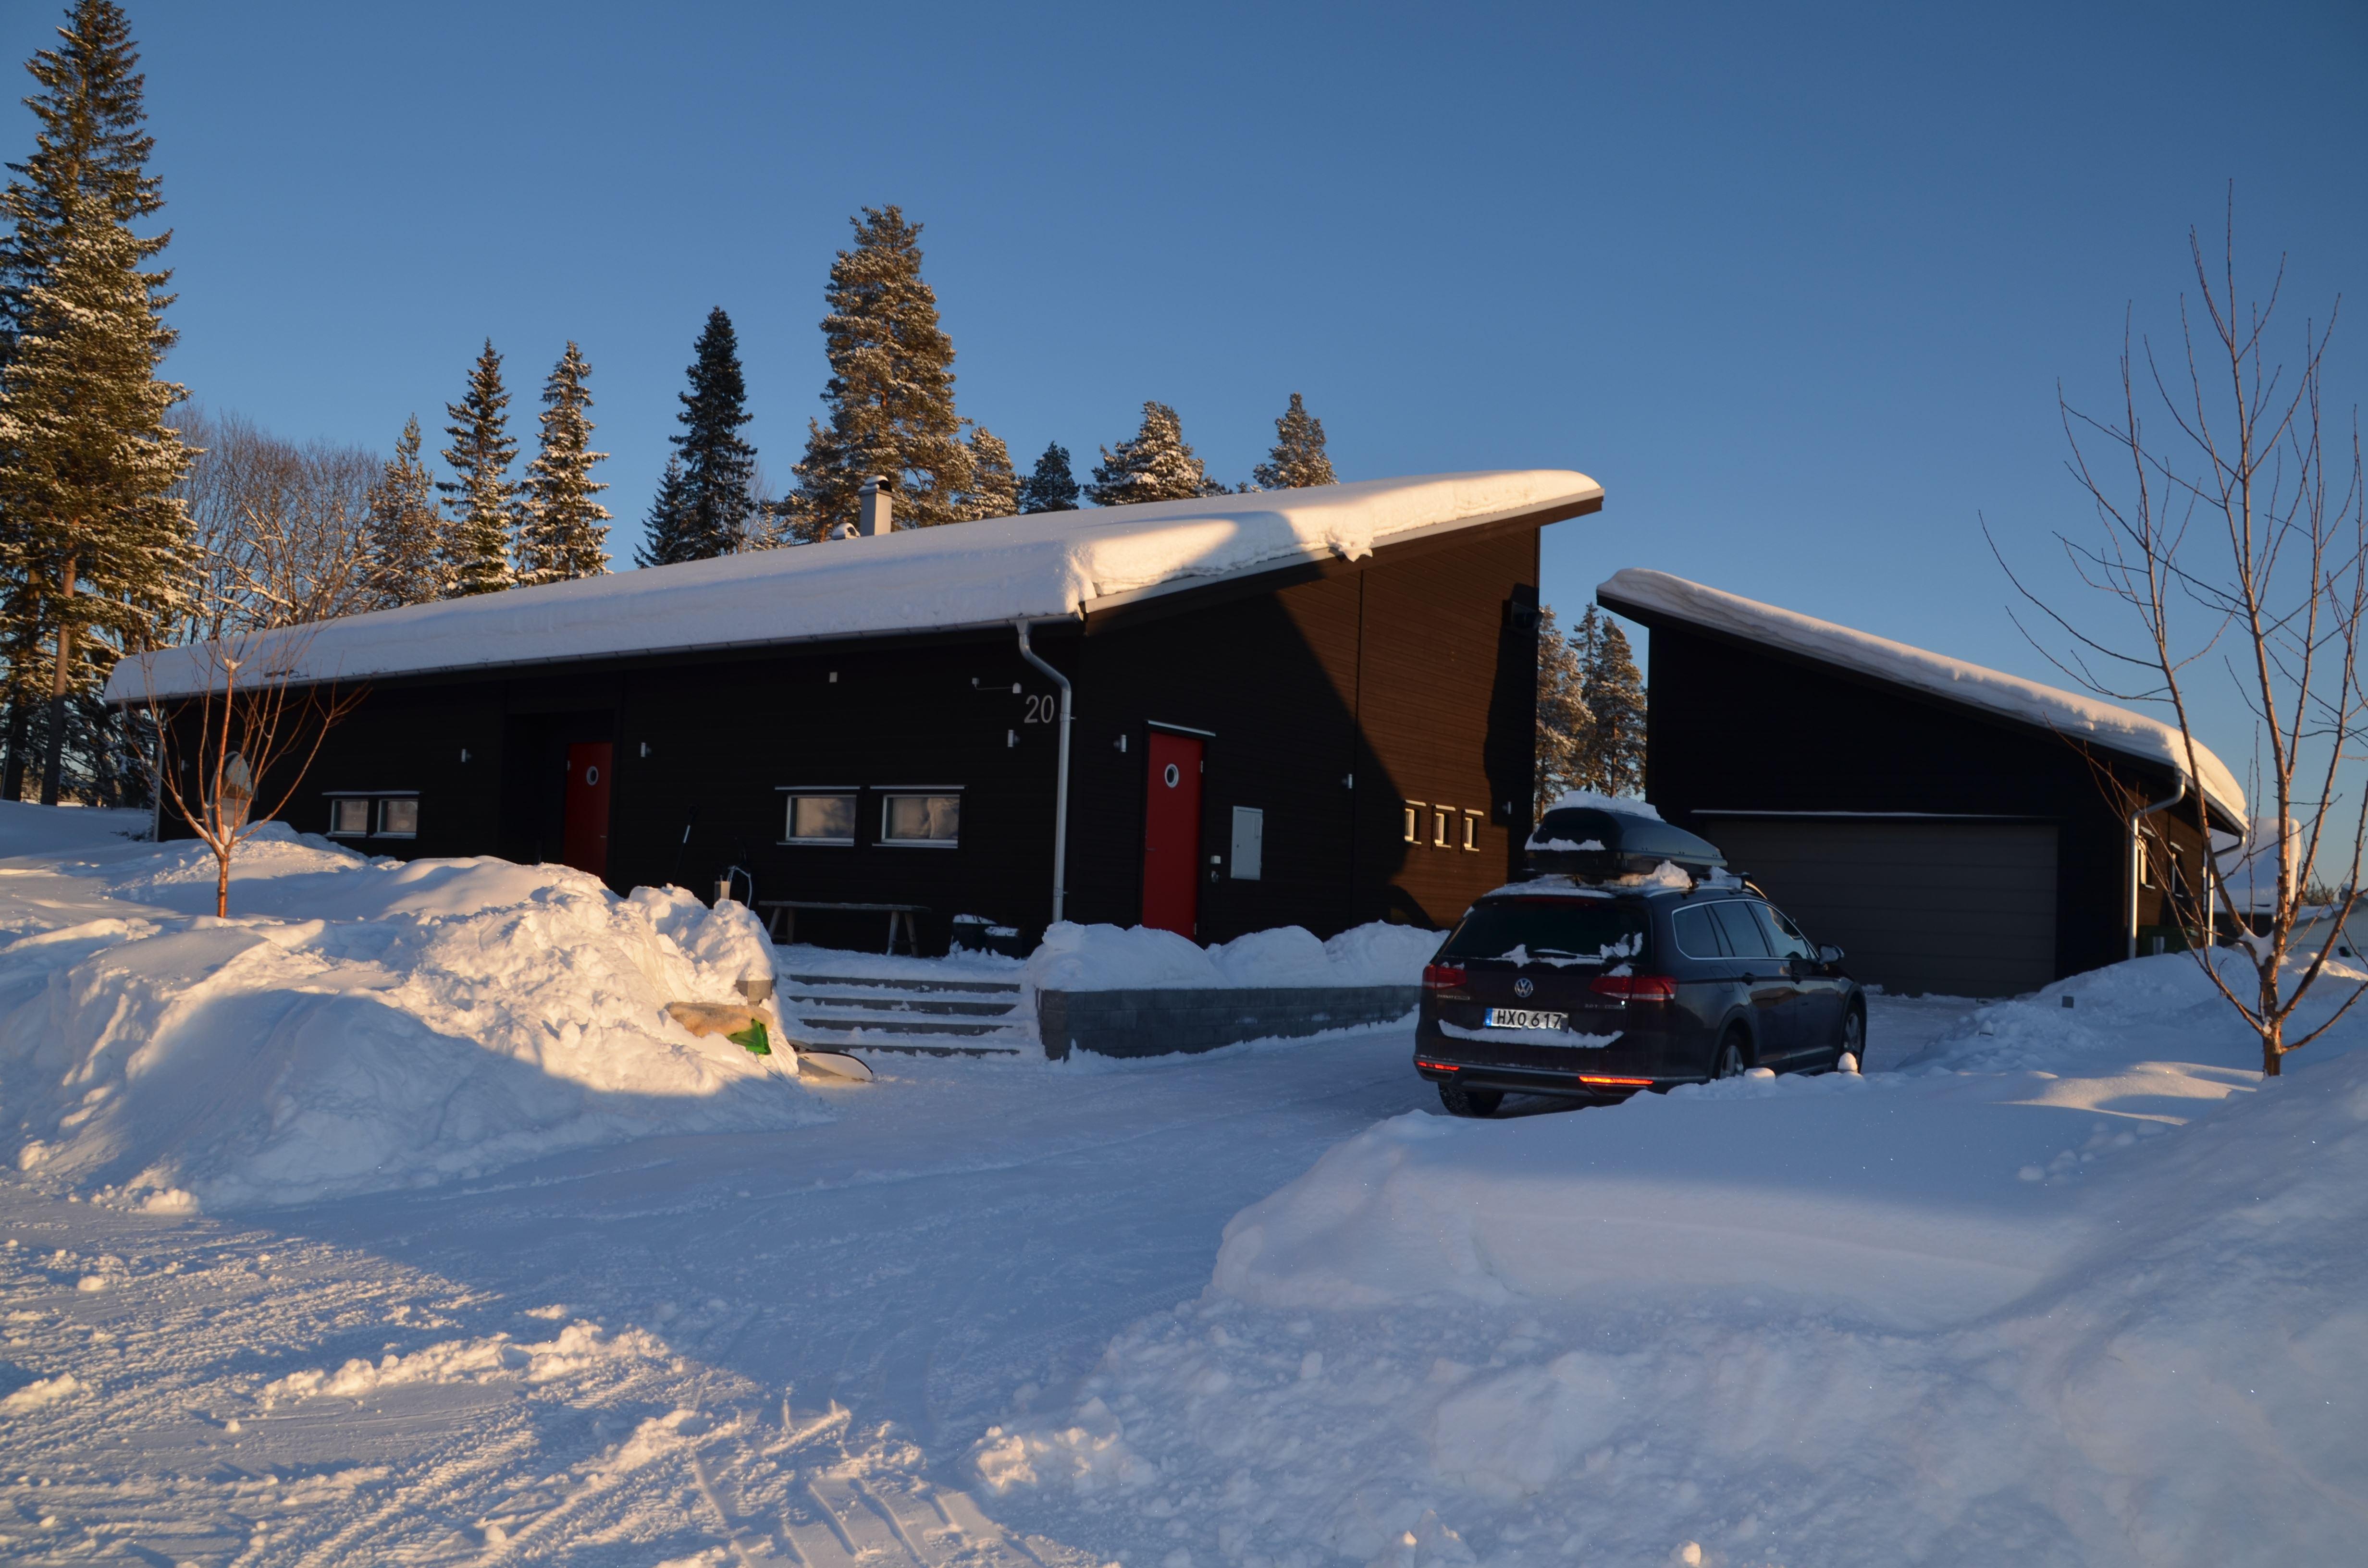 HV152 Hus Sånghusvallen